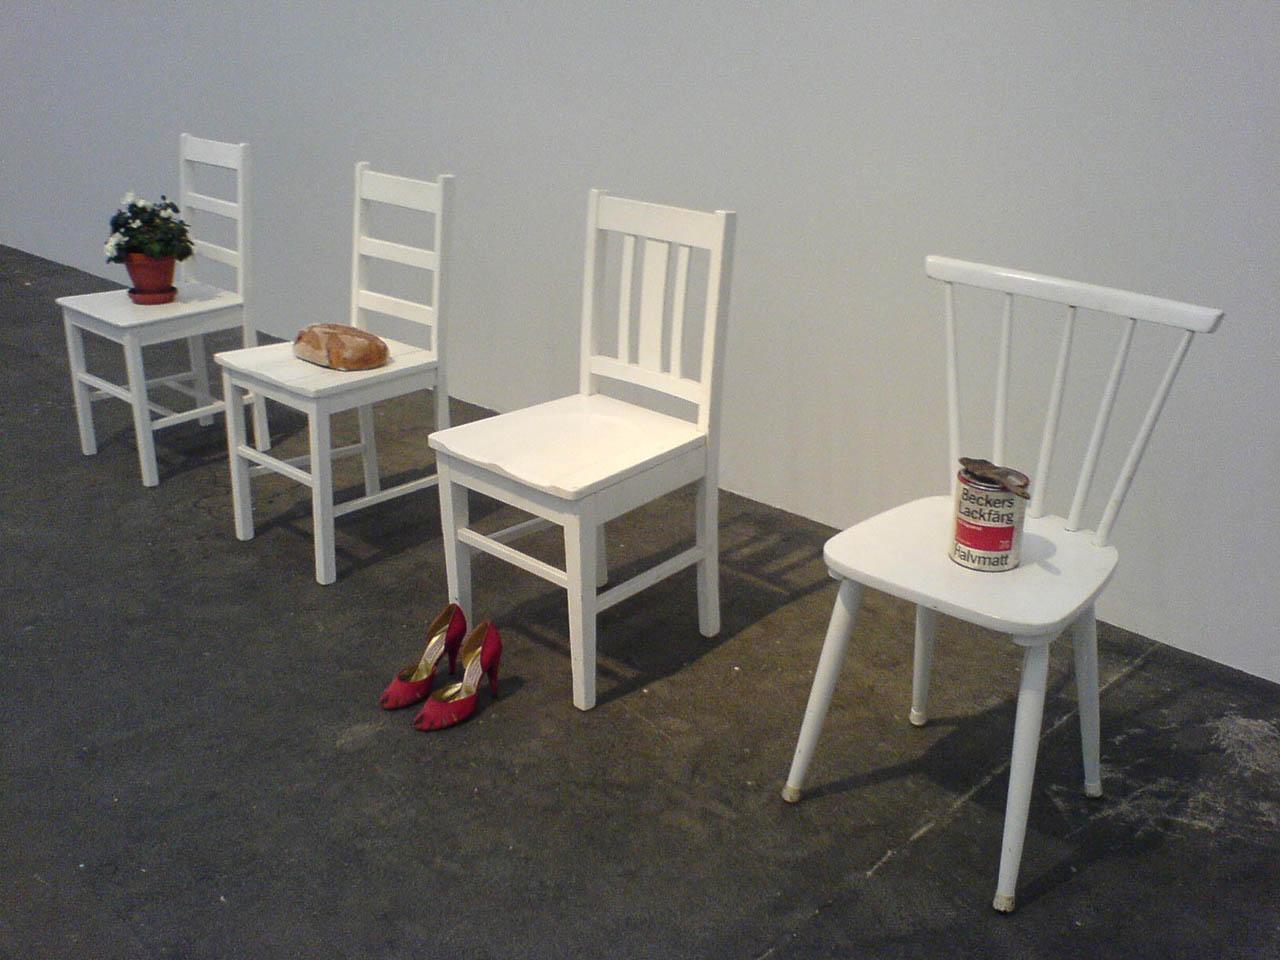 http://www.arpla.fr/canal2/figureblog/wp-content/uploads/2009/05/chairevent01.jpg